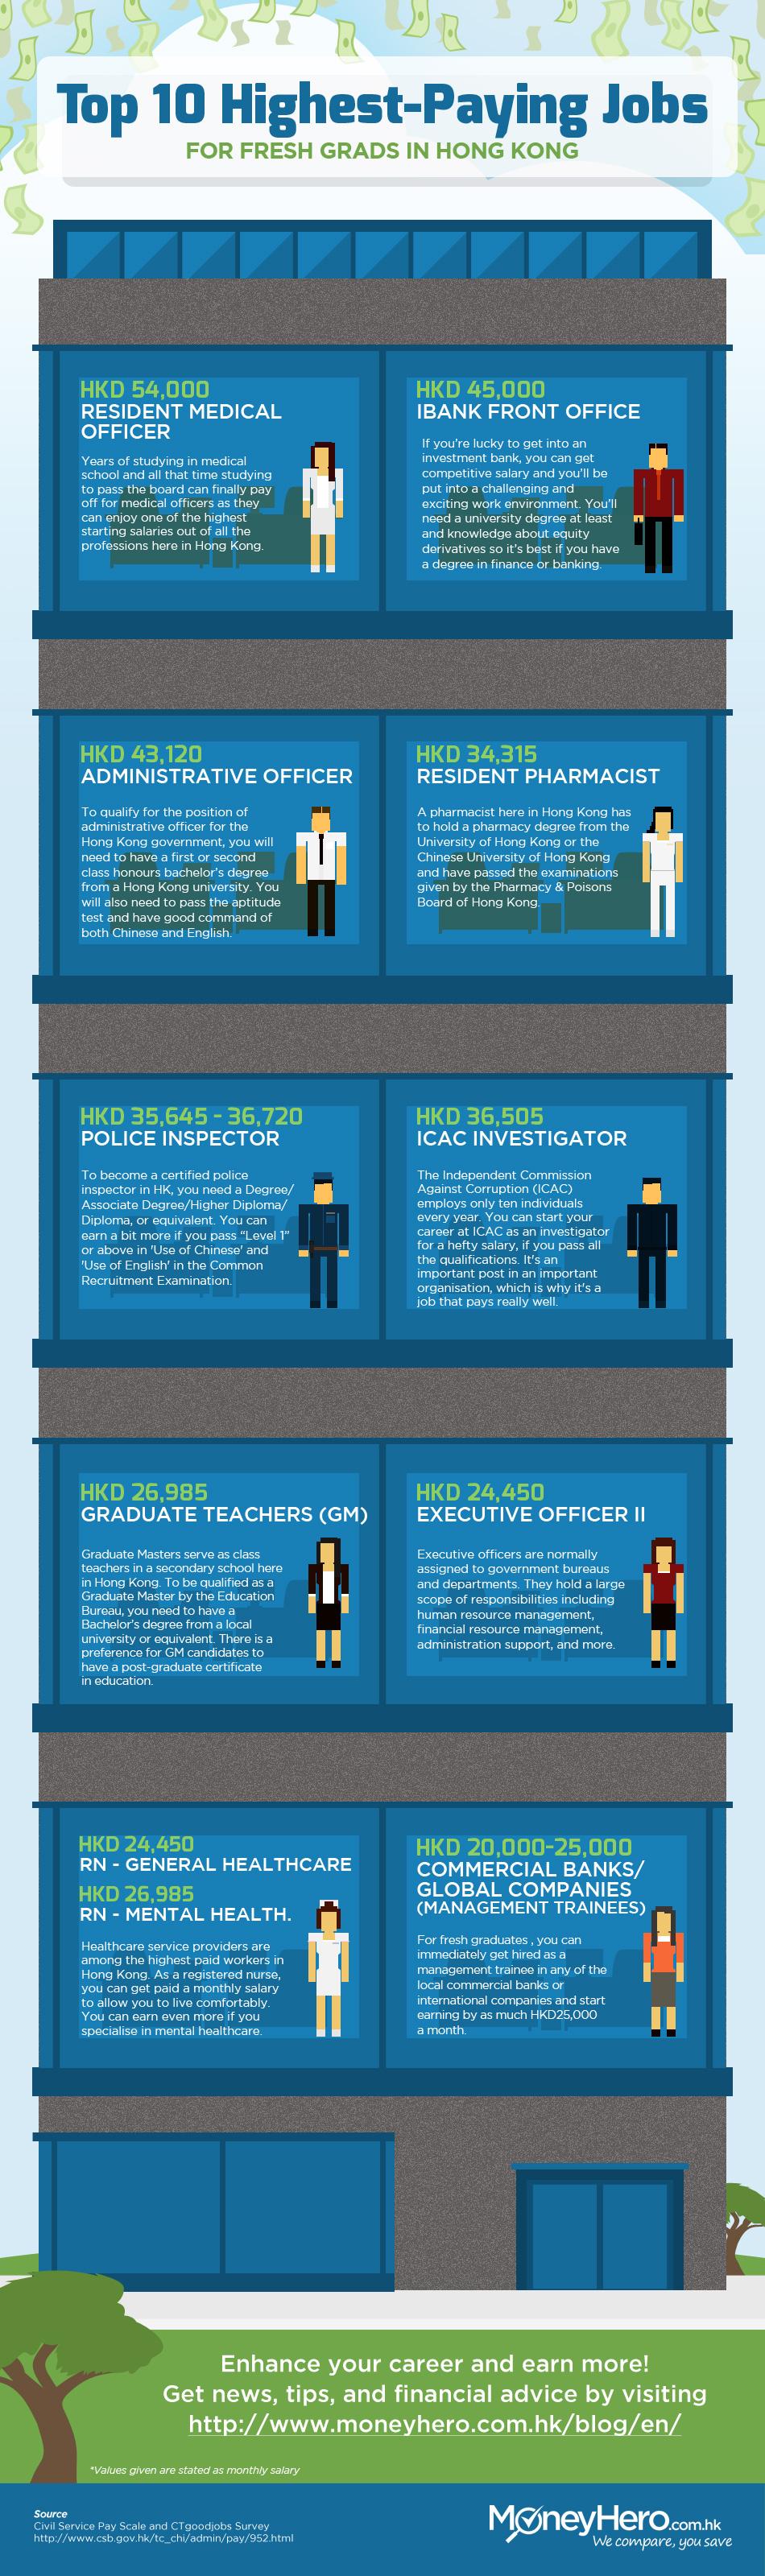 Hong Kong highest paying jobs